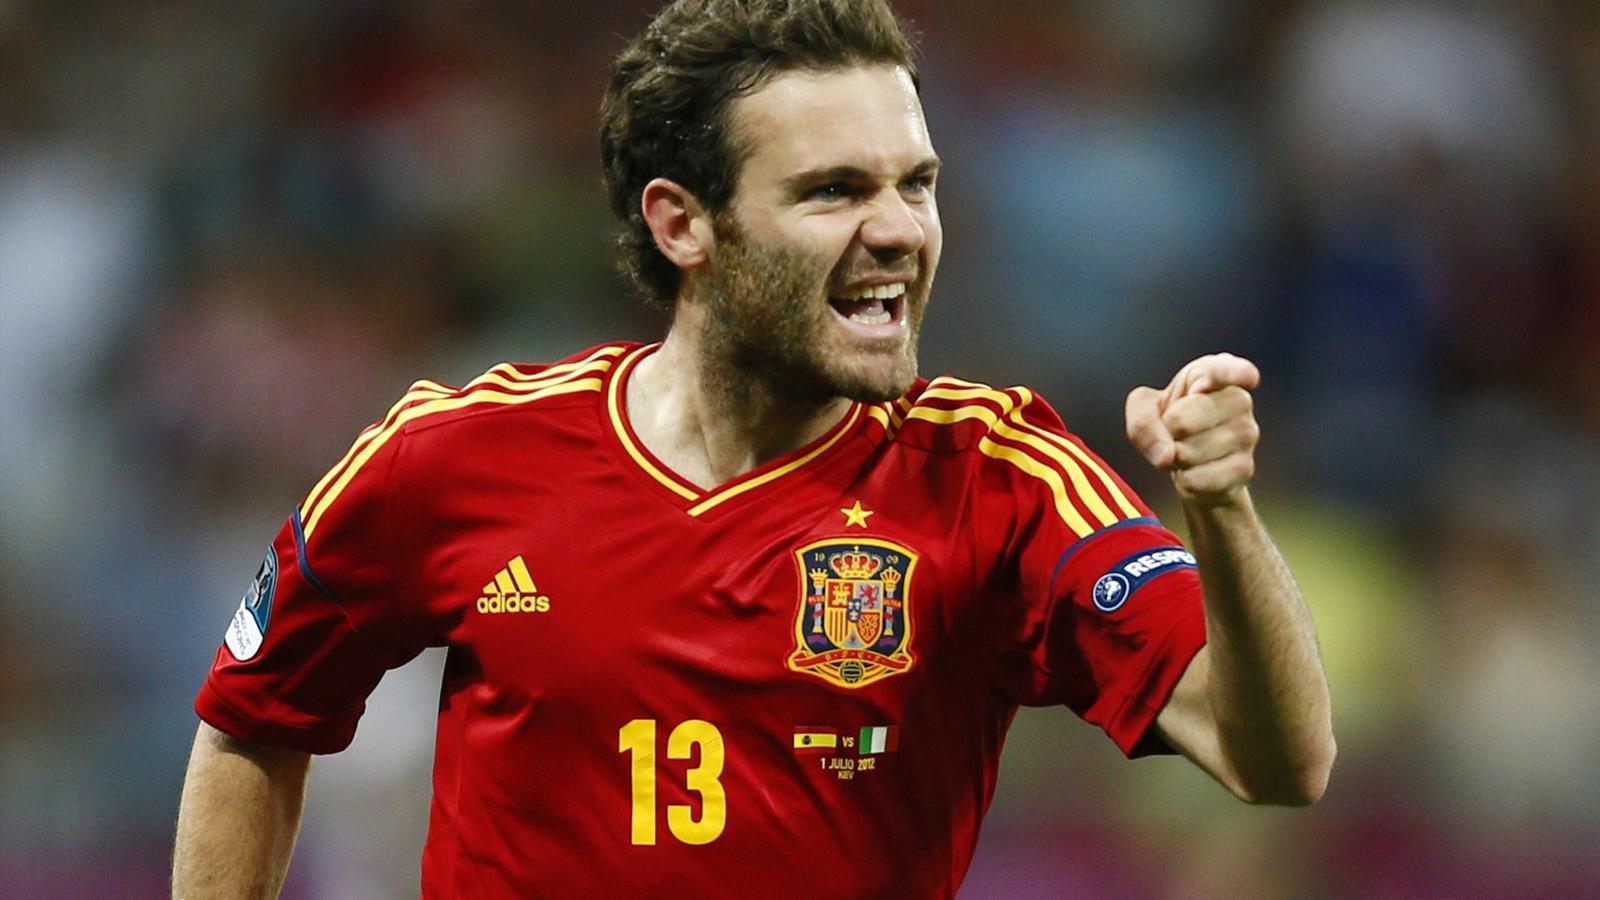 Spain la liga table standing 2016 2017 - Resume Ligue Spain Laliga Table 2016 2017 Spanish Liga Standings Keen To Return For Spain Euro